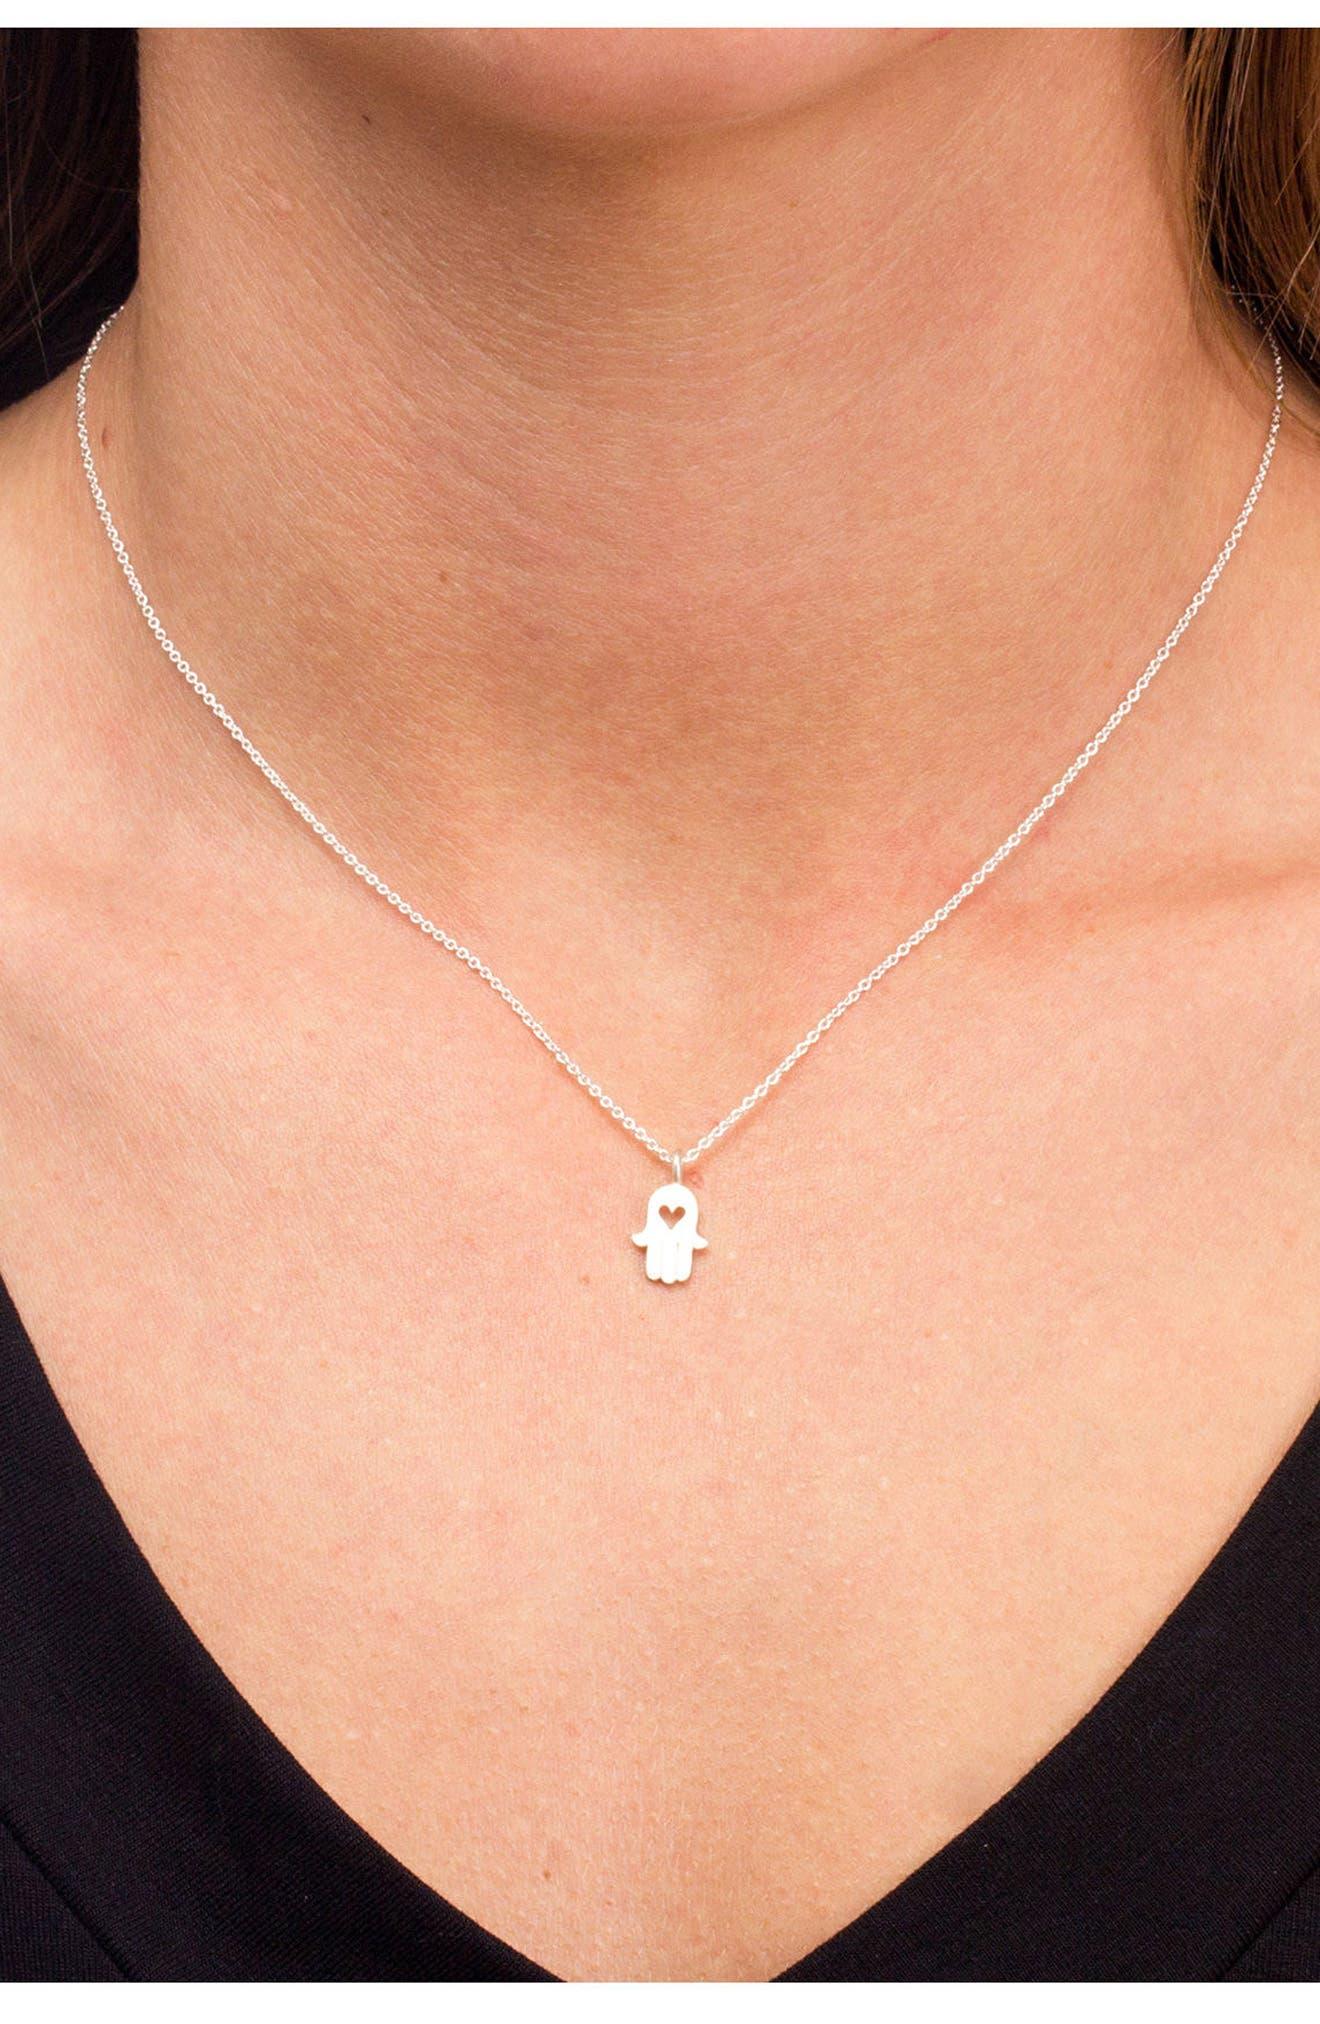 Love & Protection Pendant Necklace,                             Alternate thumbnail 2, color,                             042